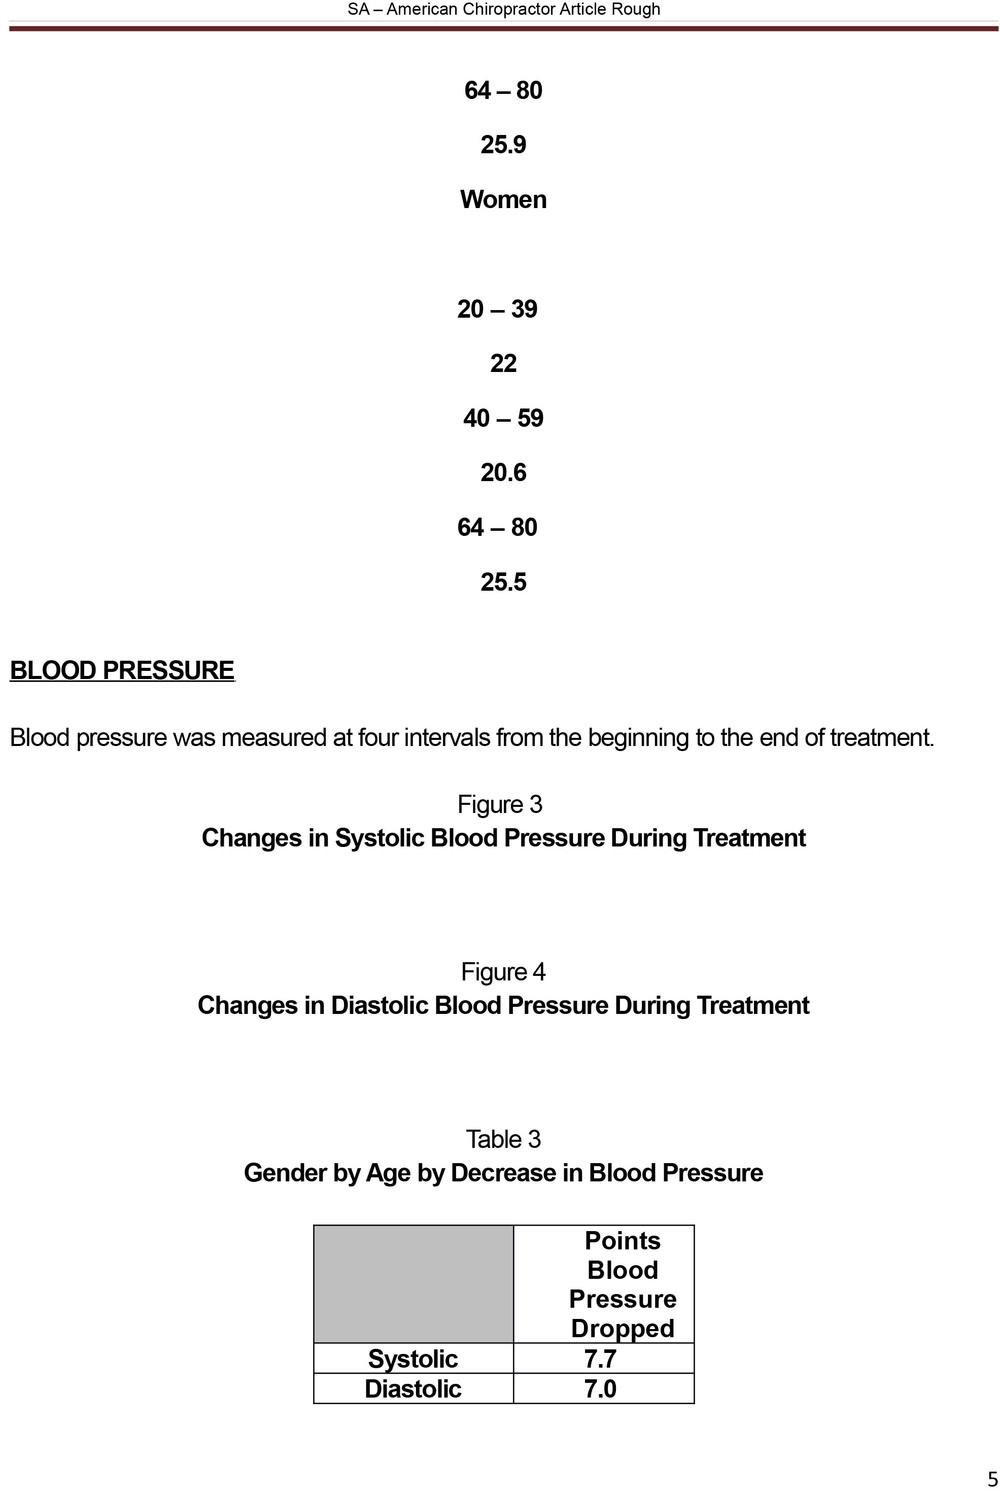 CLINCIAL STHUDIAS-5.jpg